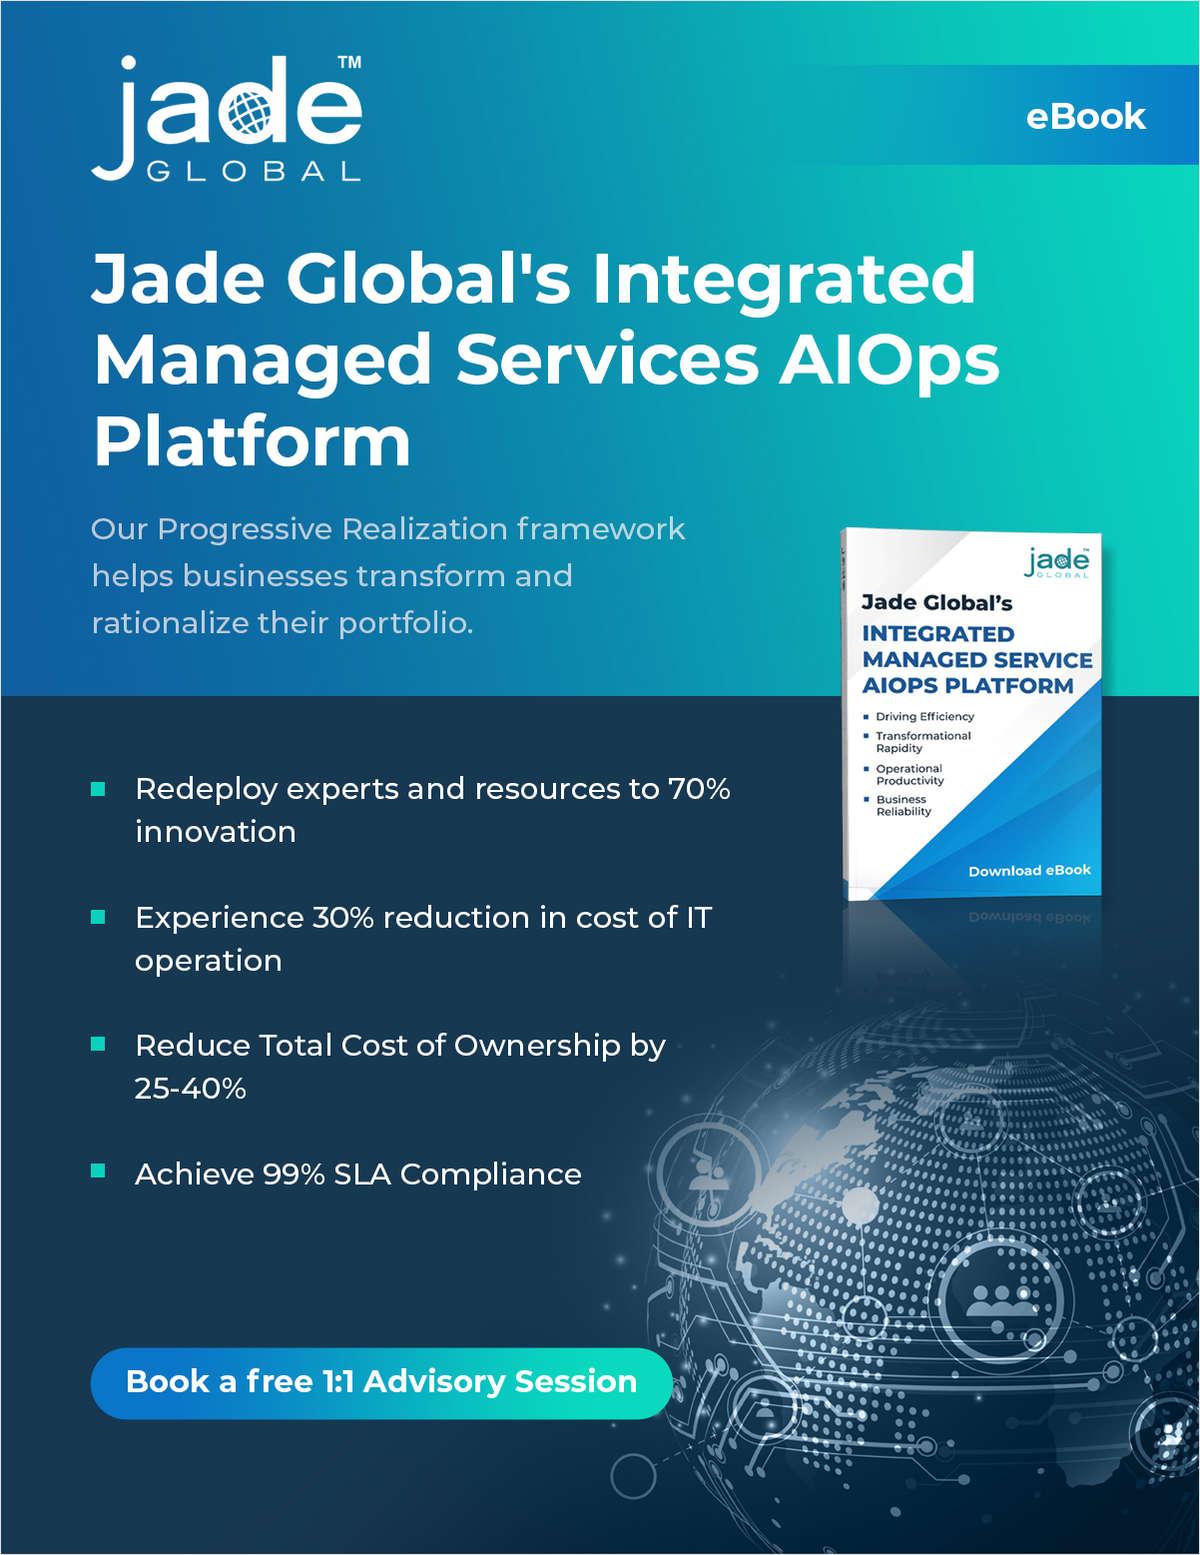 Jade Global's Integrated Managed Services AIOps Platform